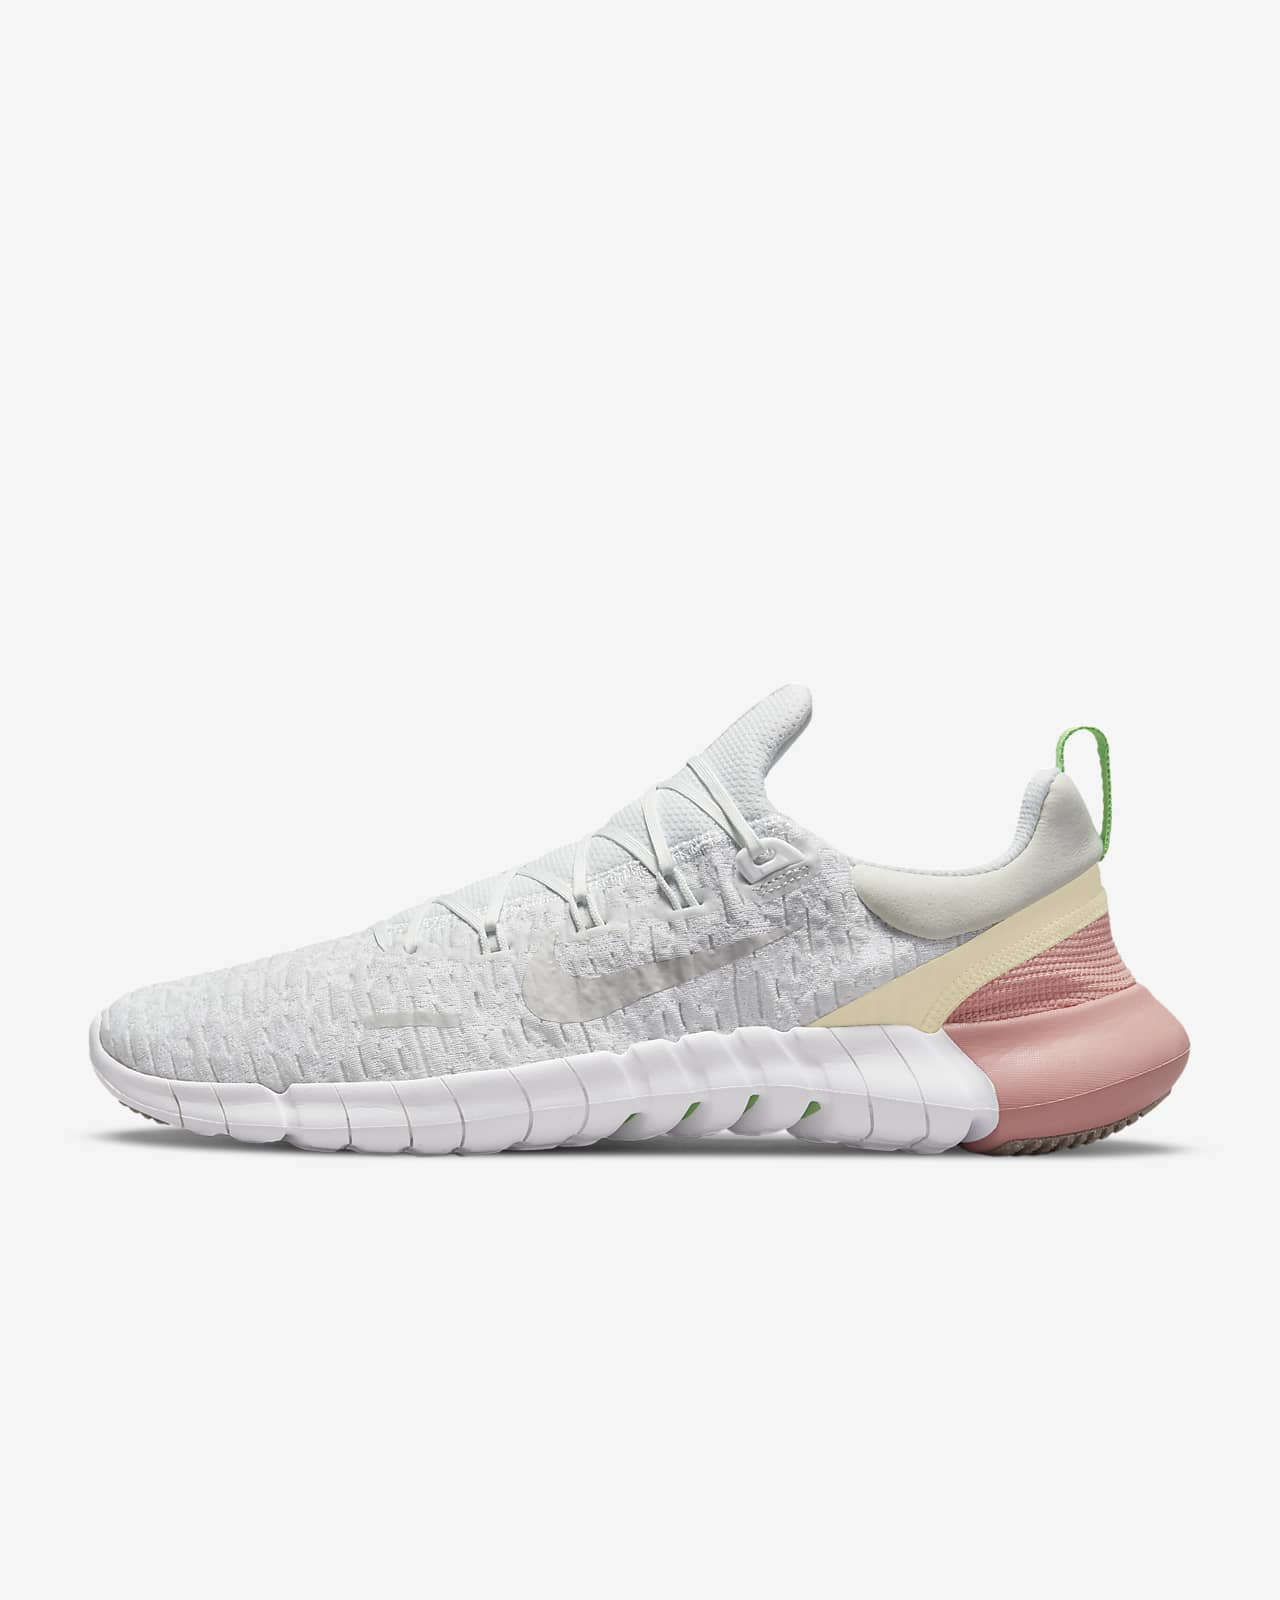 Nike Free Run 5.0 Men's Running Shoe